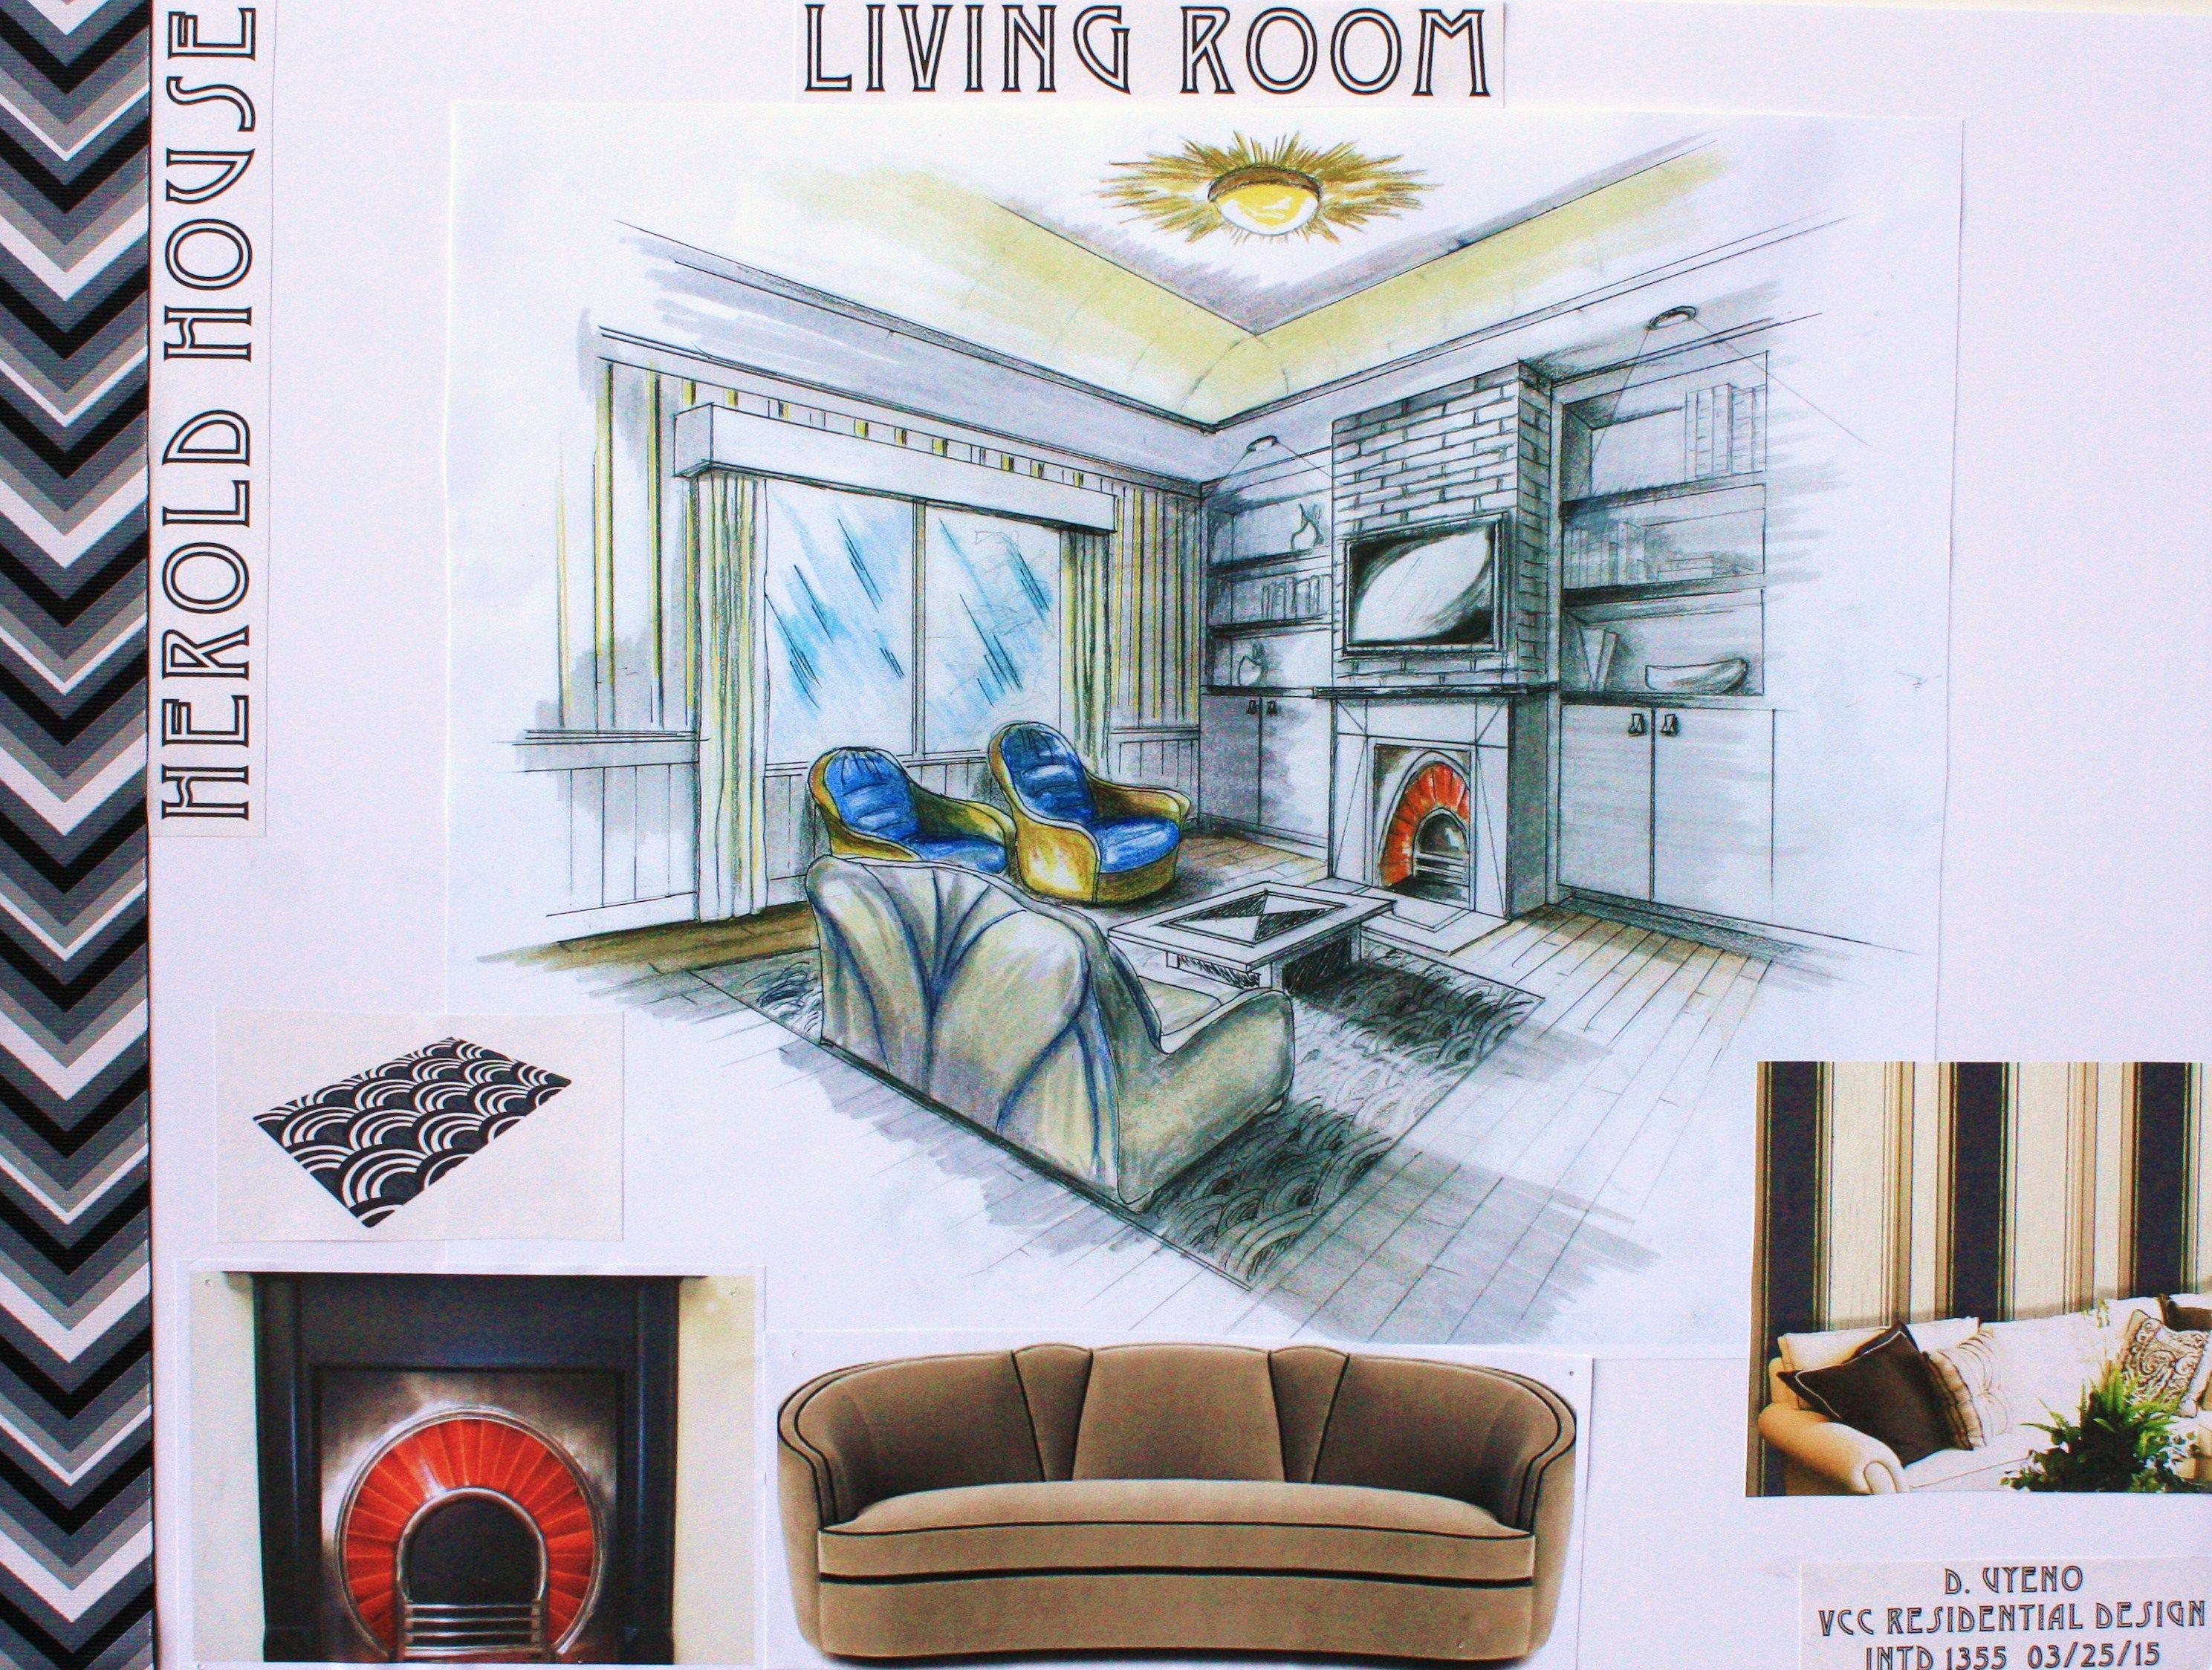 Living room presentation board for VCC Residential Design Rendered